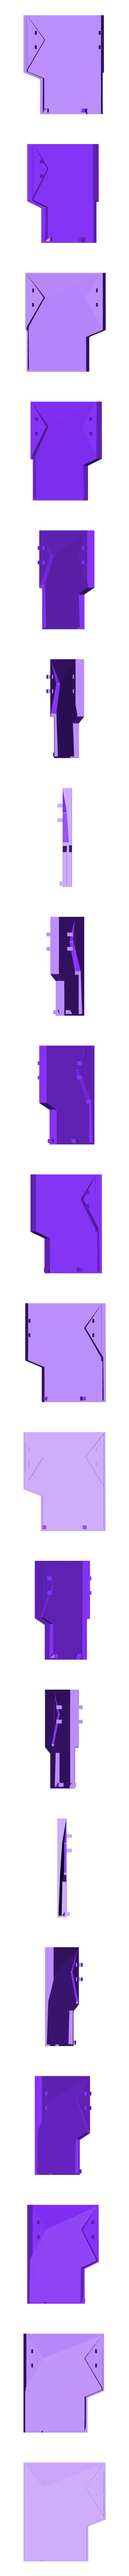 4.stl Download free STL file MARBLE BOY automat • 3D printer object, Janis_Bruchwalski